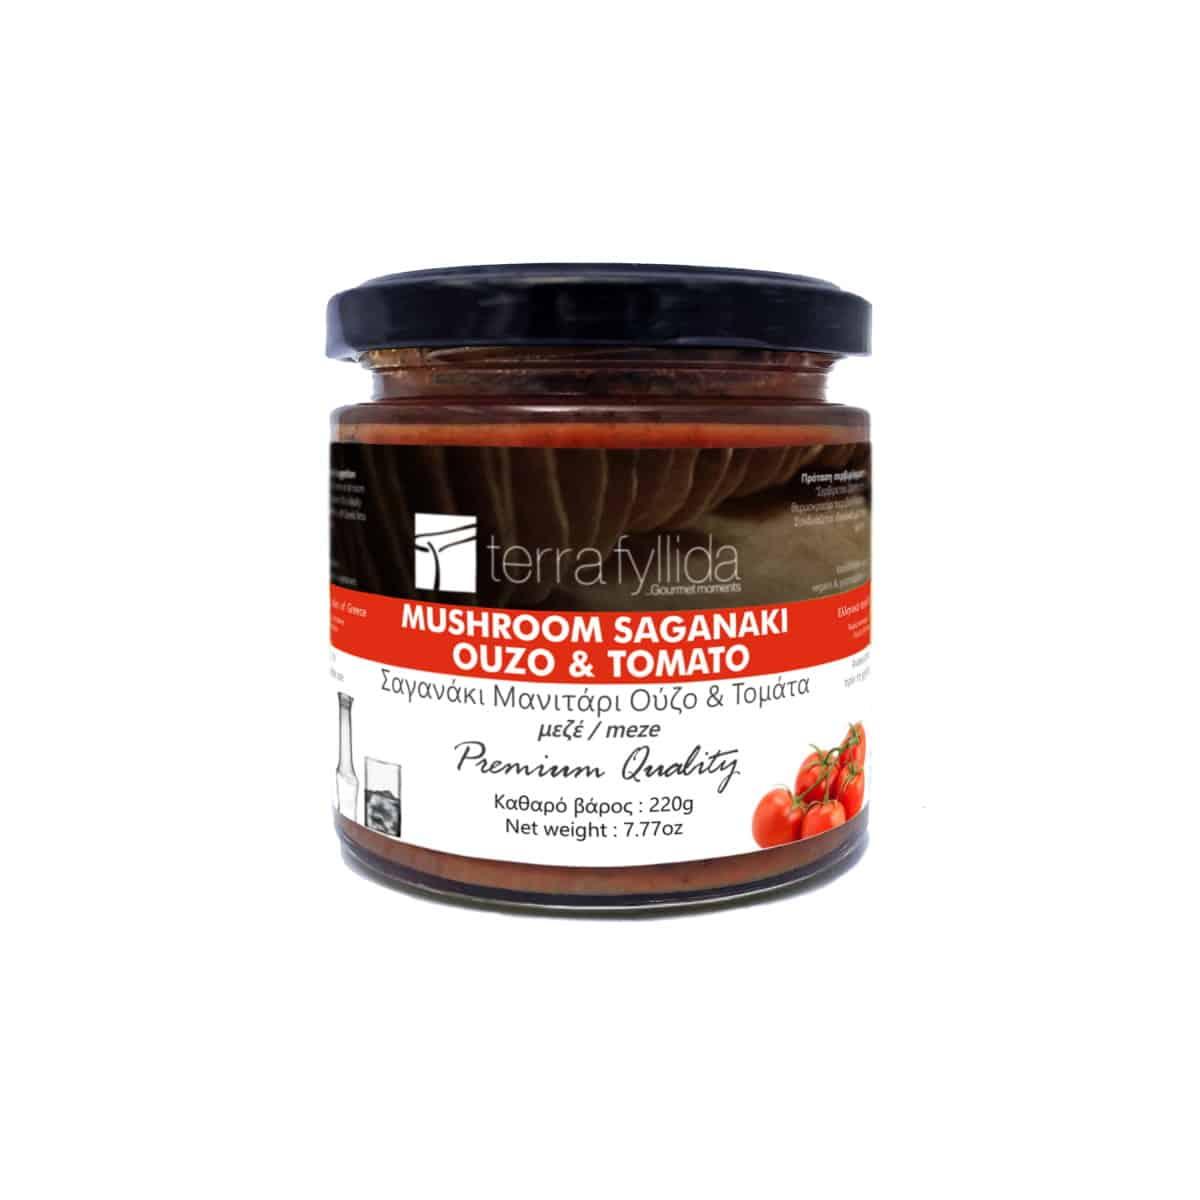 TERRA-FYLLIDA-Mushroom Saganaki with ouzo & tomato